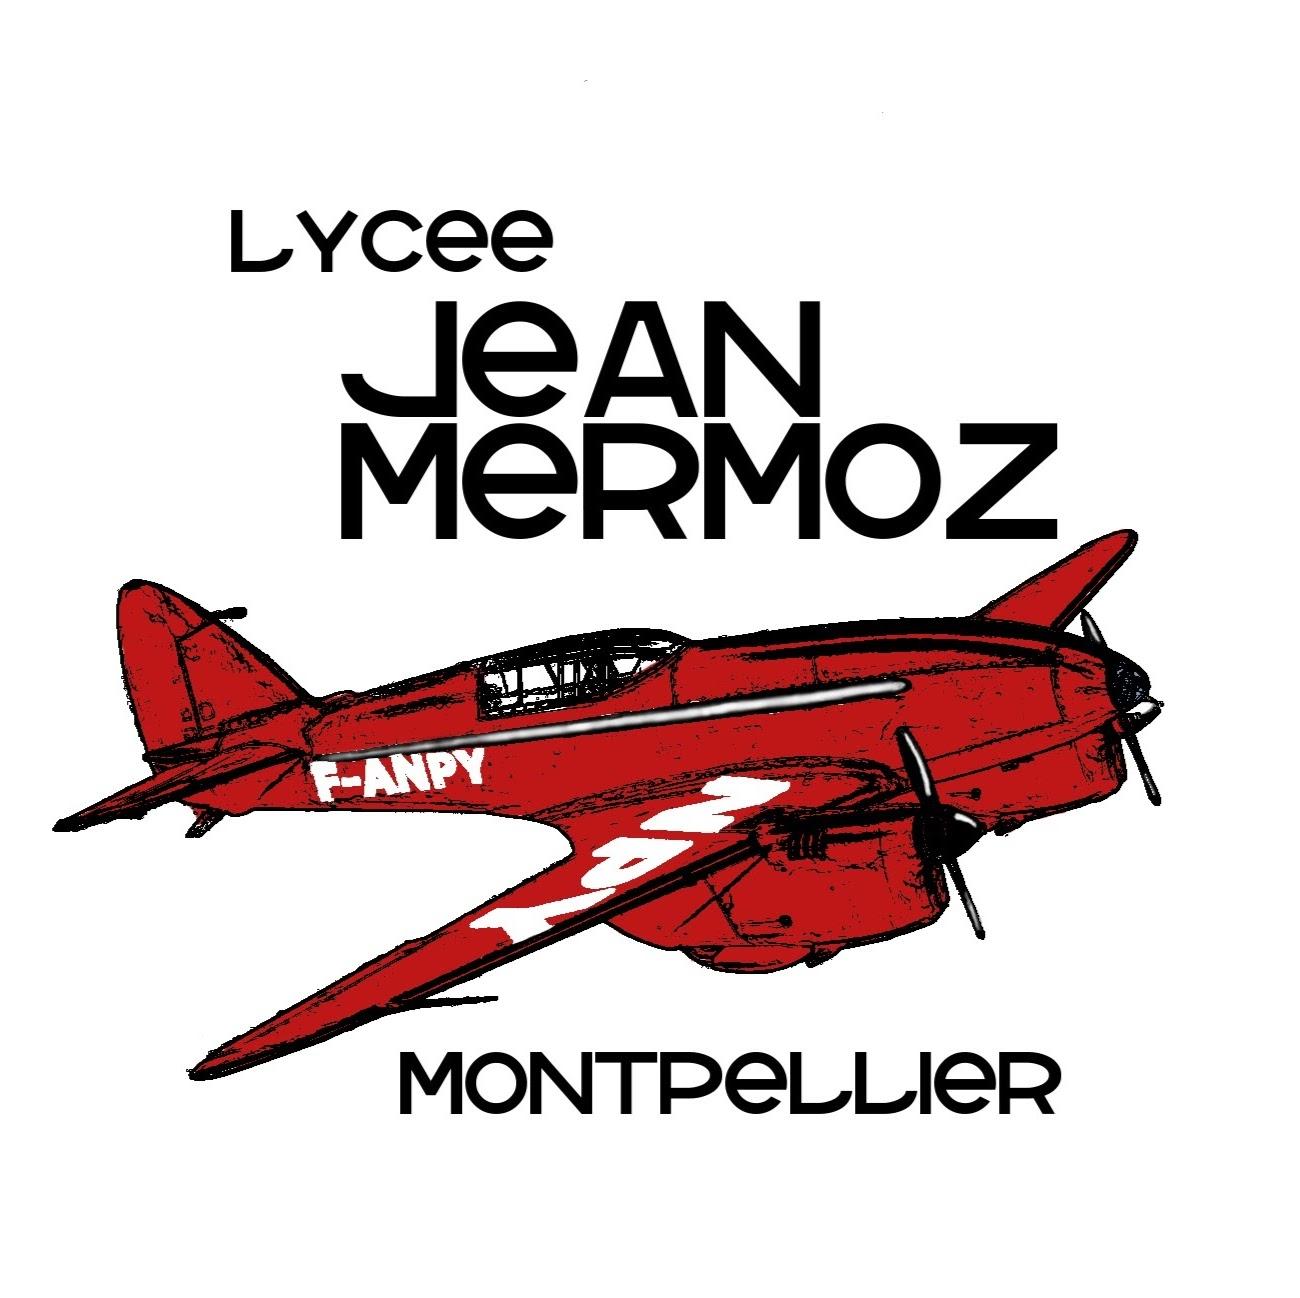 Lycée Jean Mermoz Montpellier